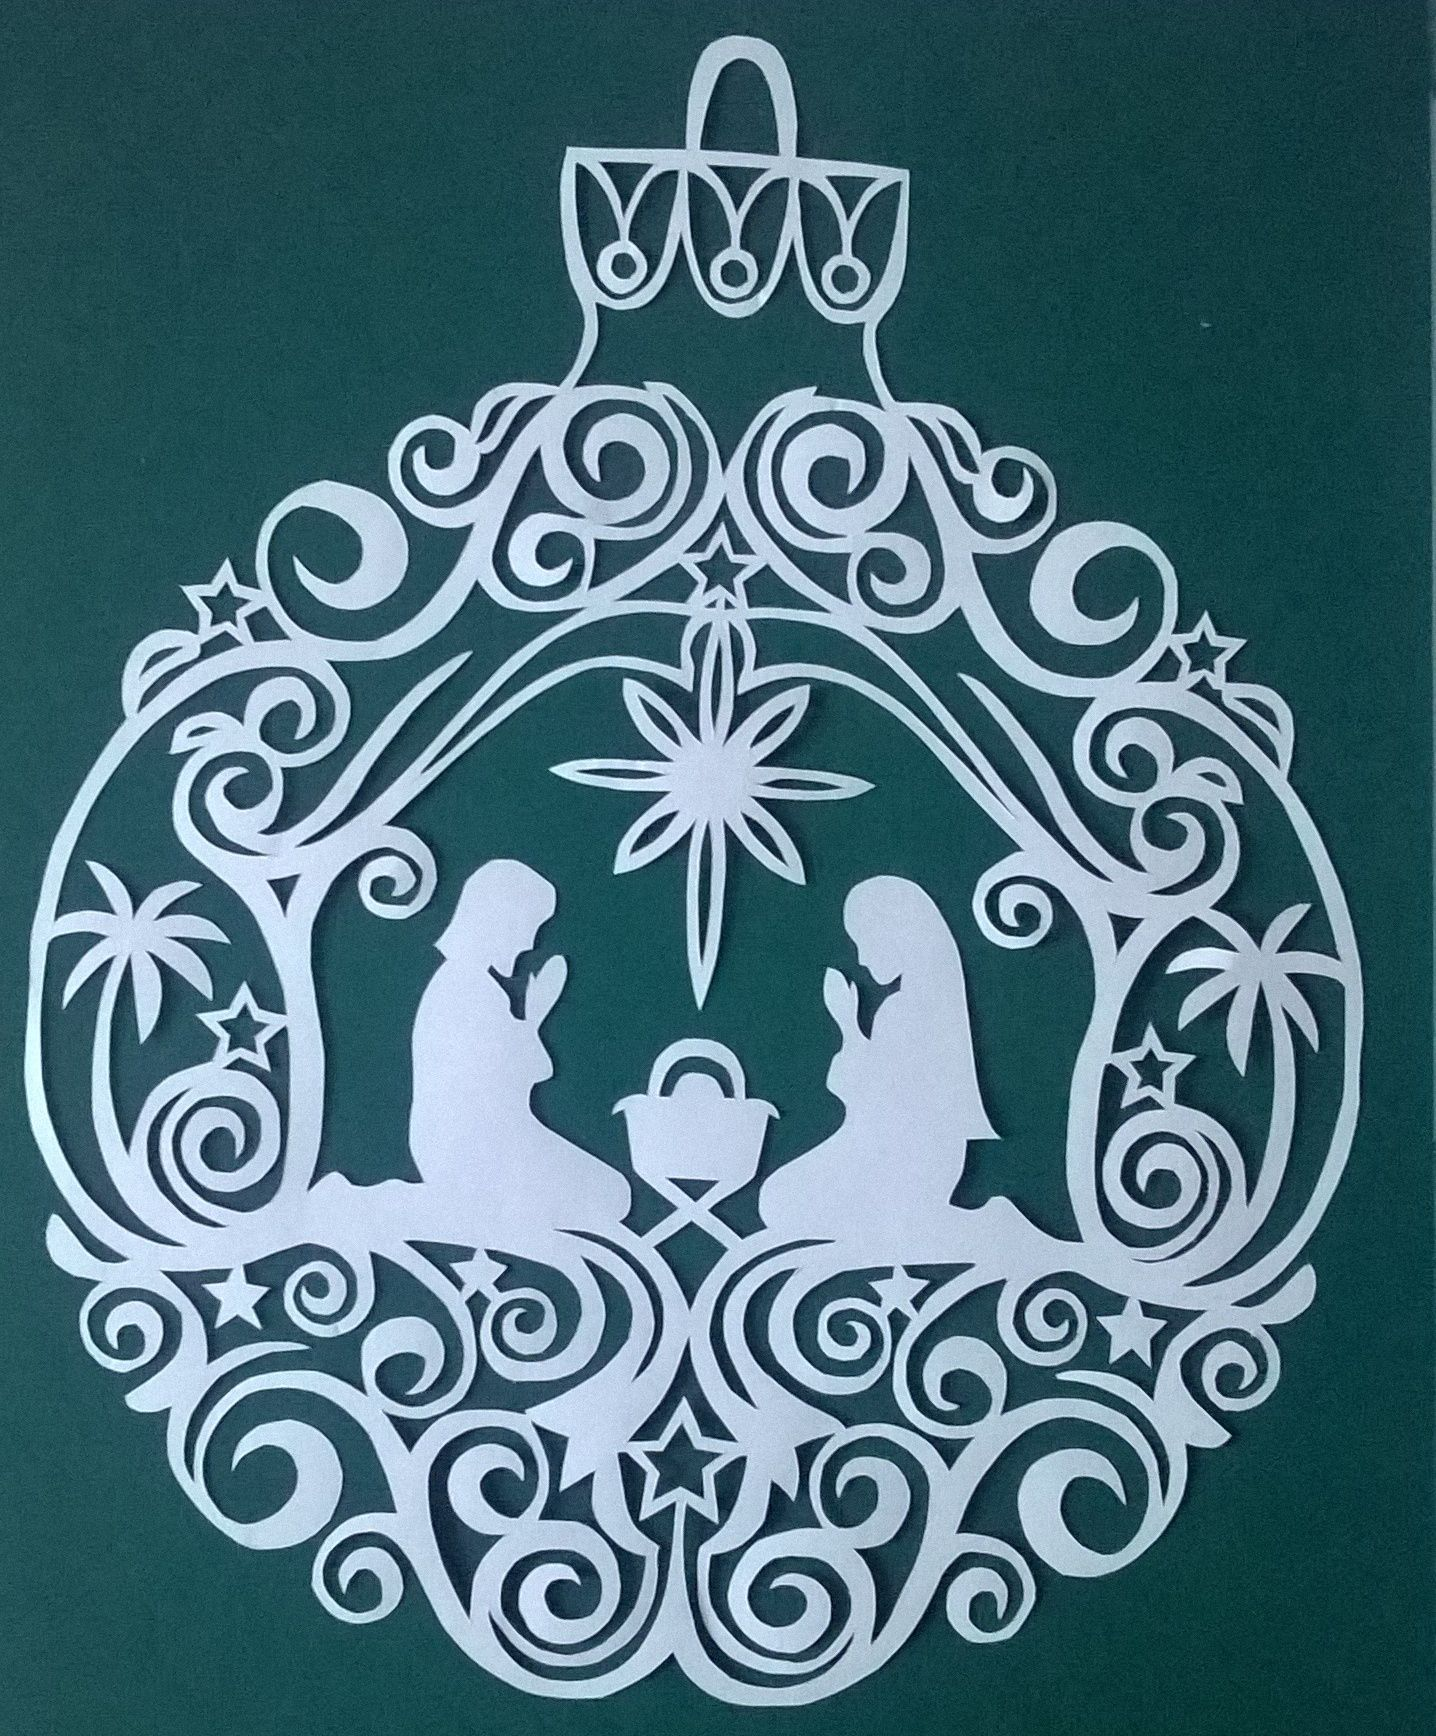 Картинки, открытки в символах